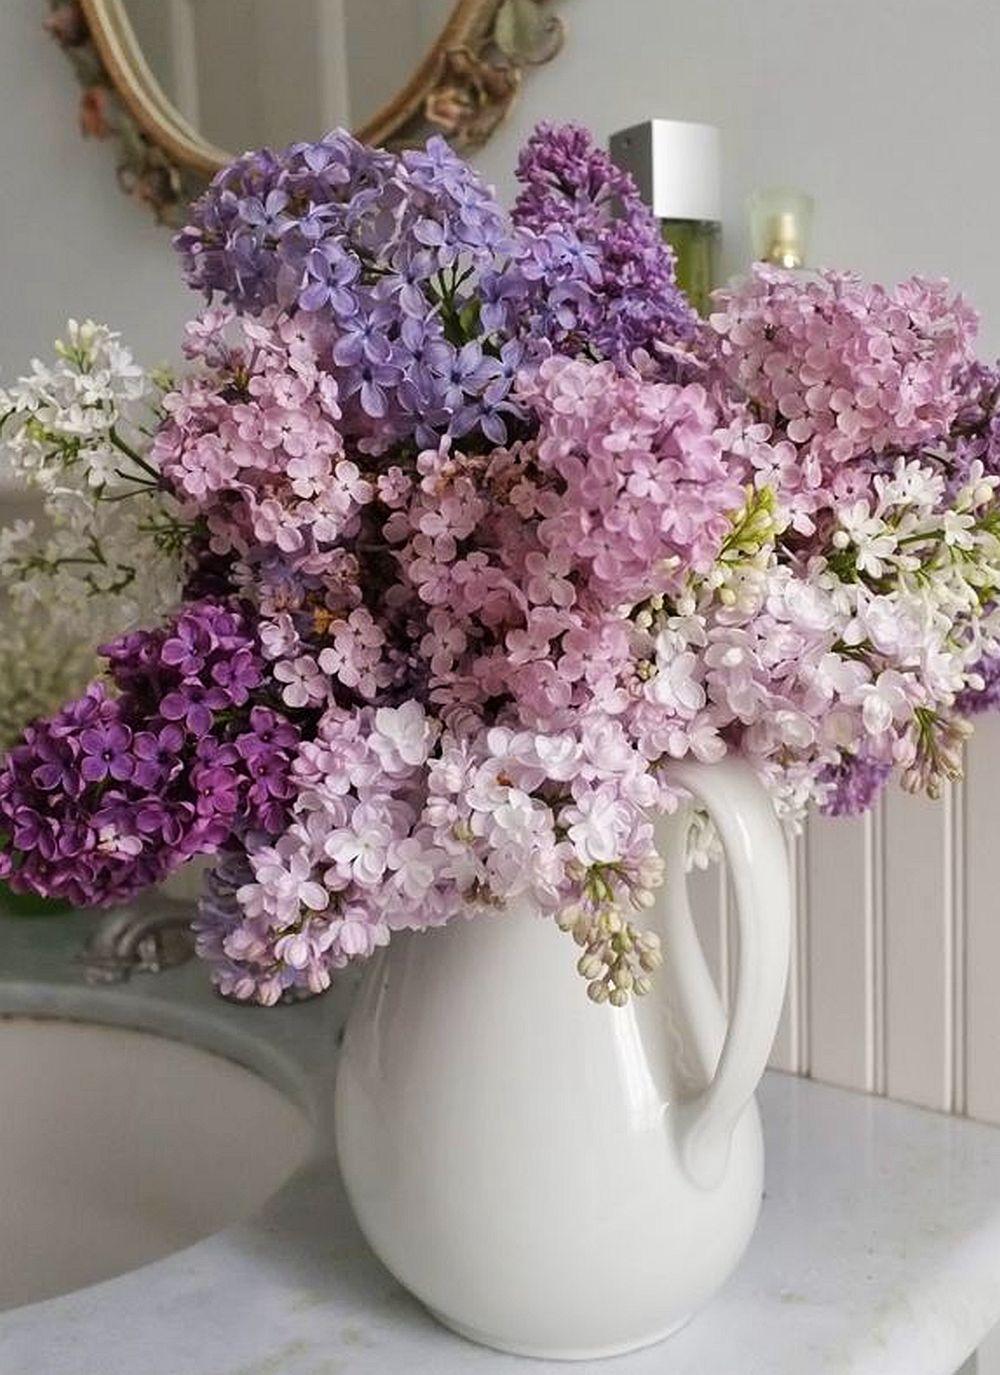 adelaparvu.com despre liliac, cum pastrezi liliacul mai mult timp in vaza, Text Carli Marian (2)